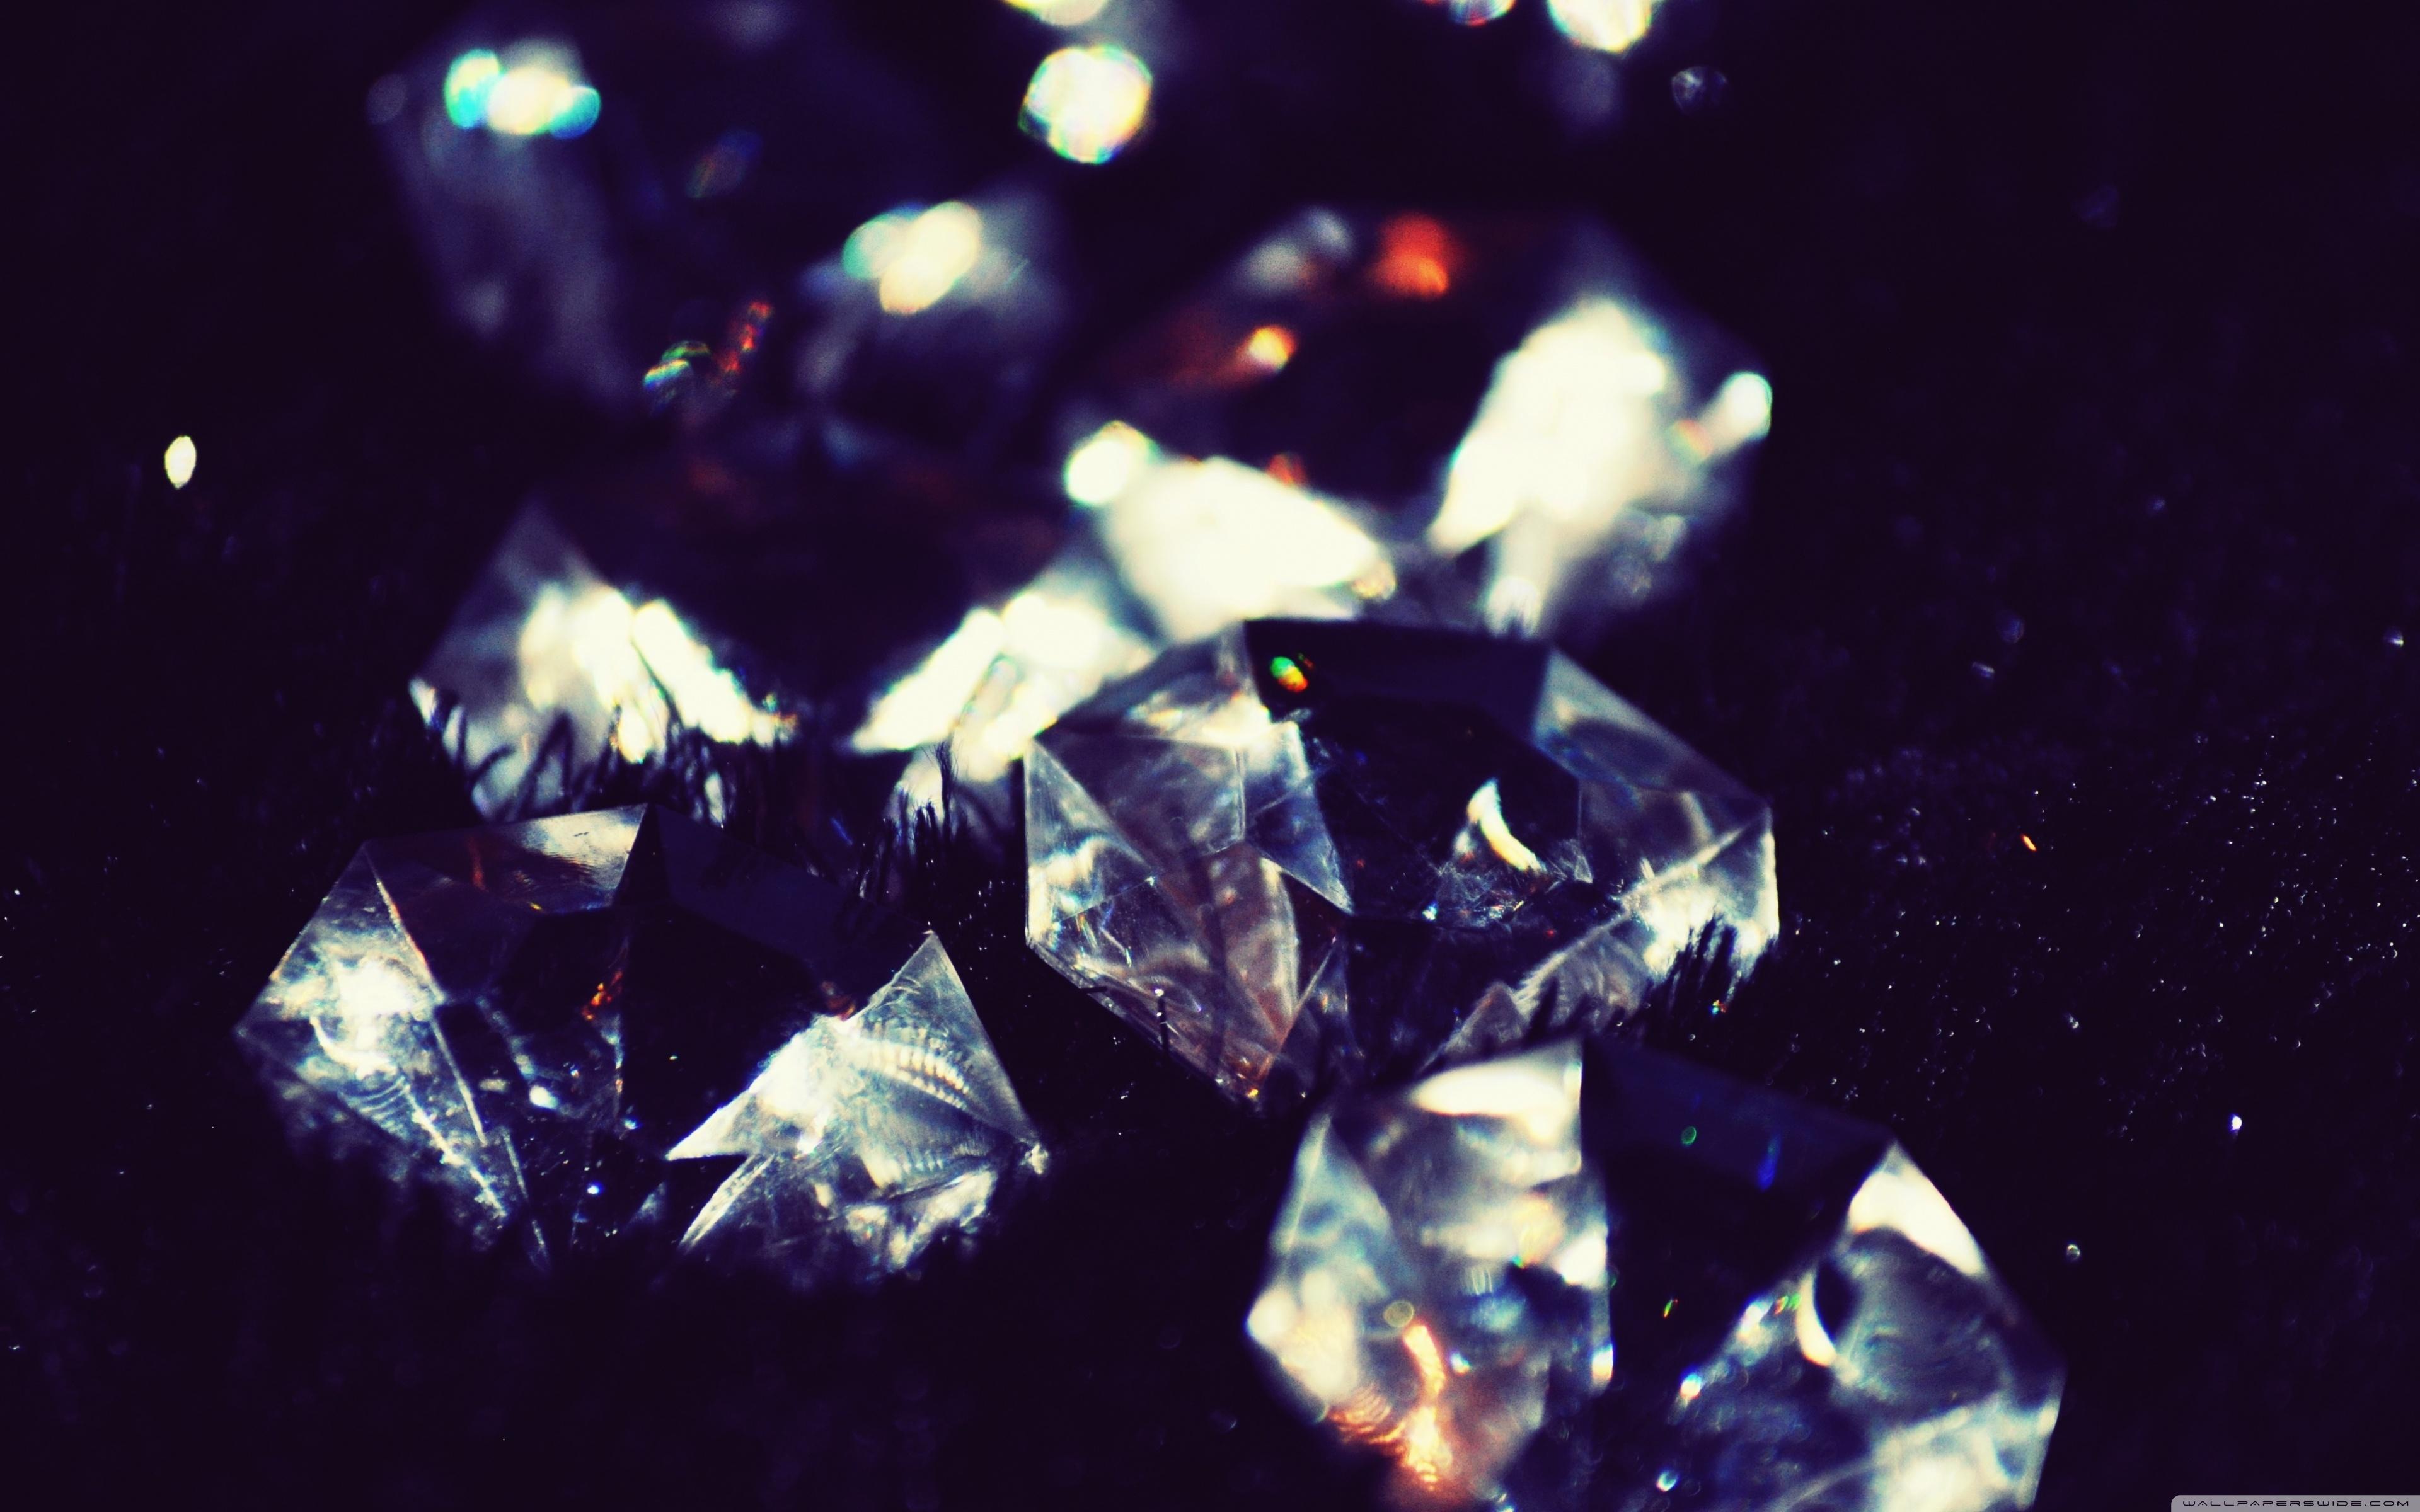 Diamond Wallpaper Hd Diamond Wallpaper 4k 122302 Hd